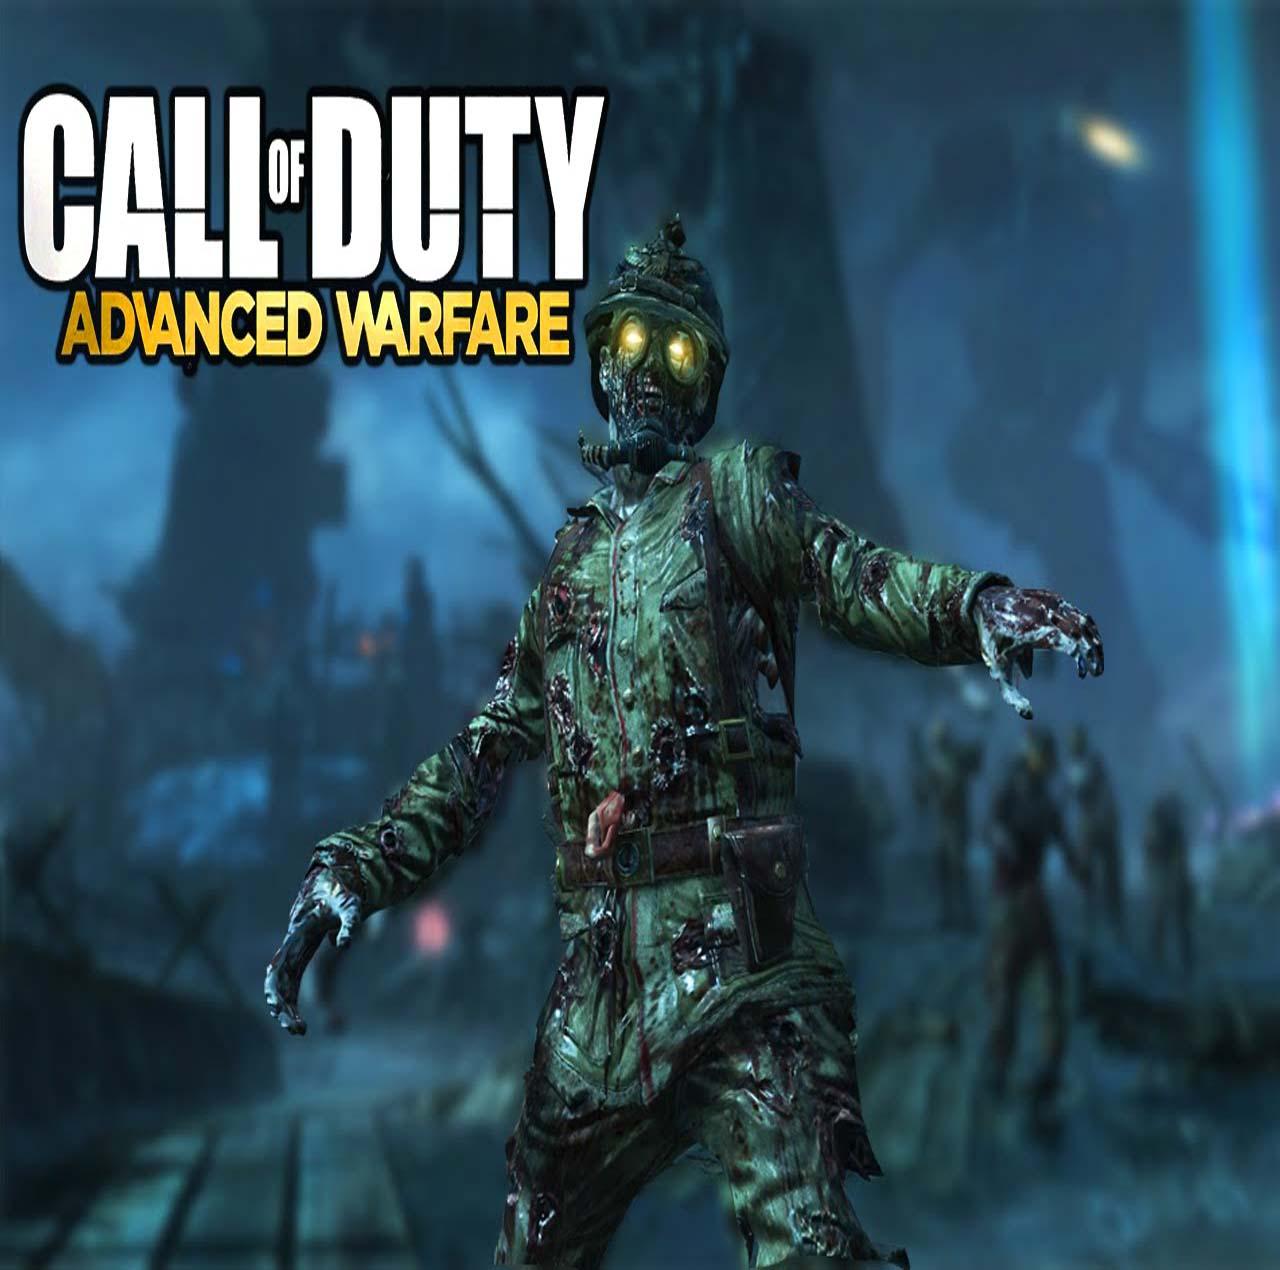 Call of Duty Advanced Warfare Exo Zombies in Havoc DLC ... Call Of Duty Advanced Warfare Havoc Zombies